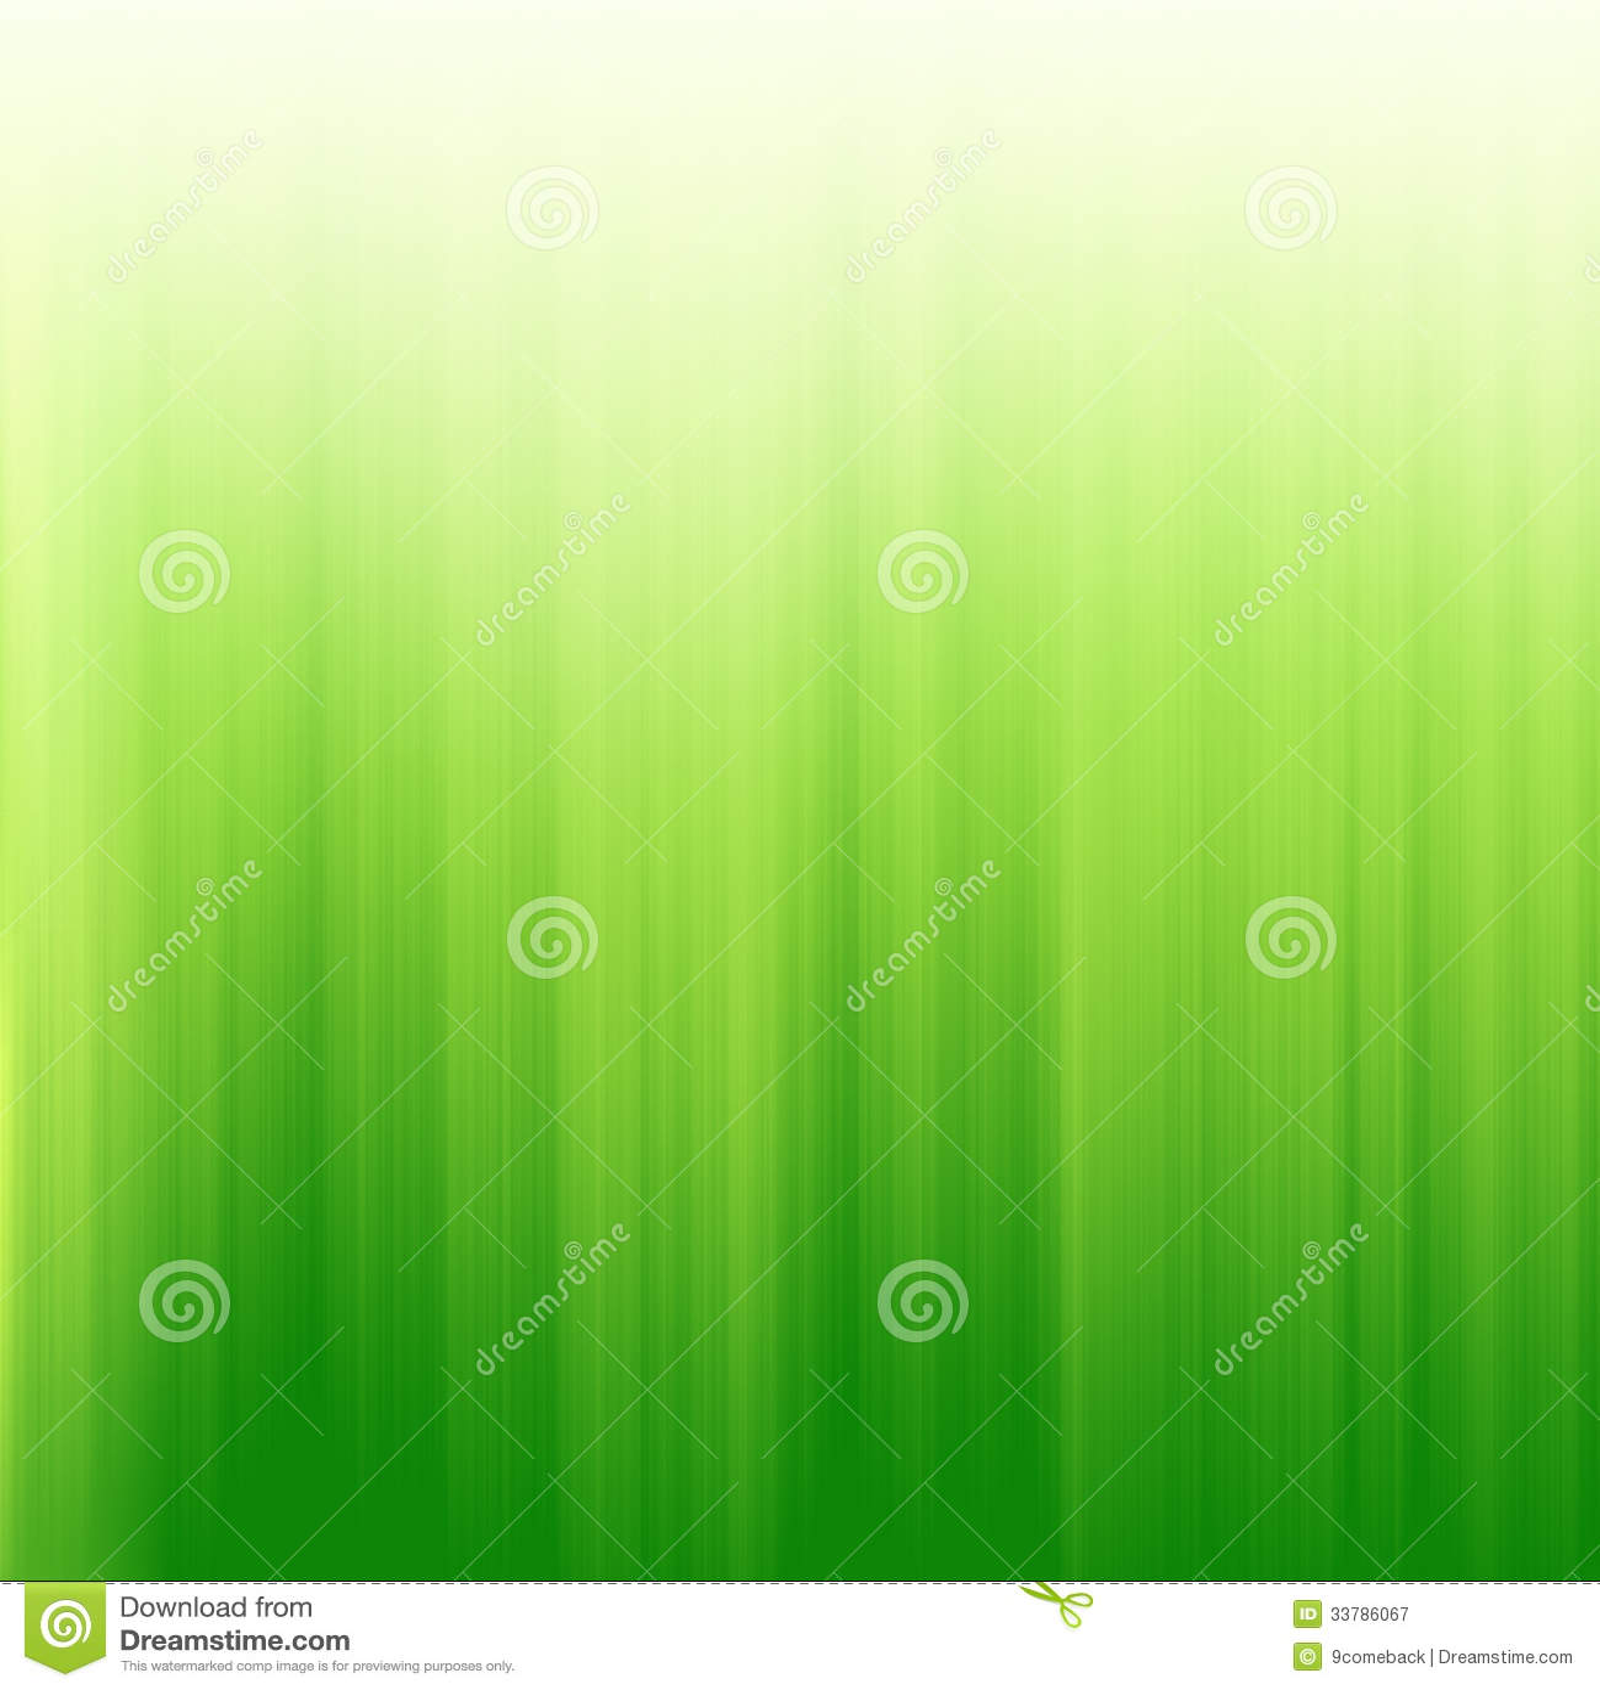 Fondos abstractos verdes